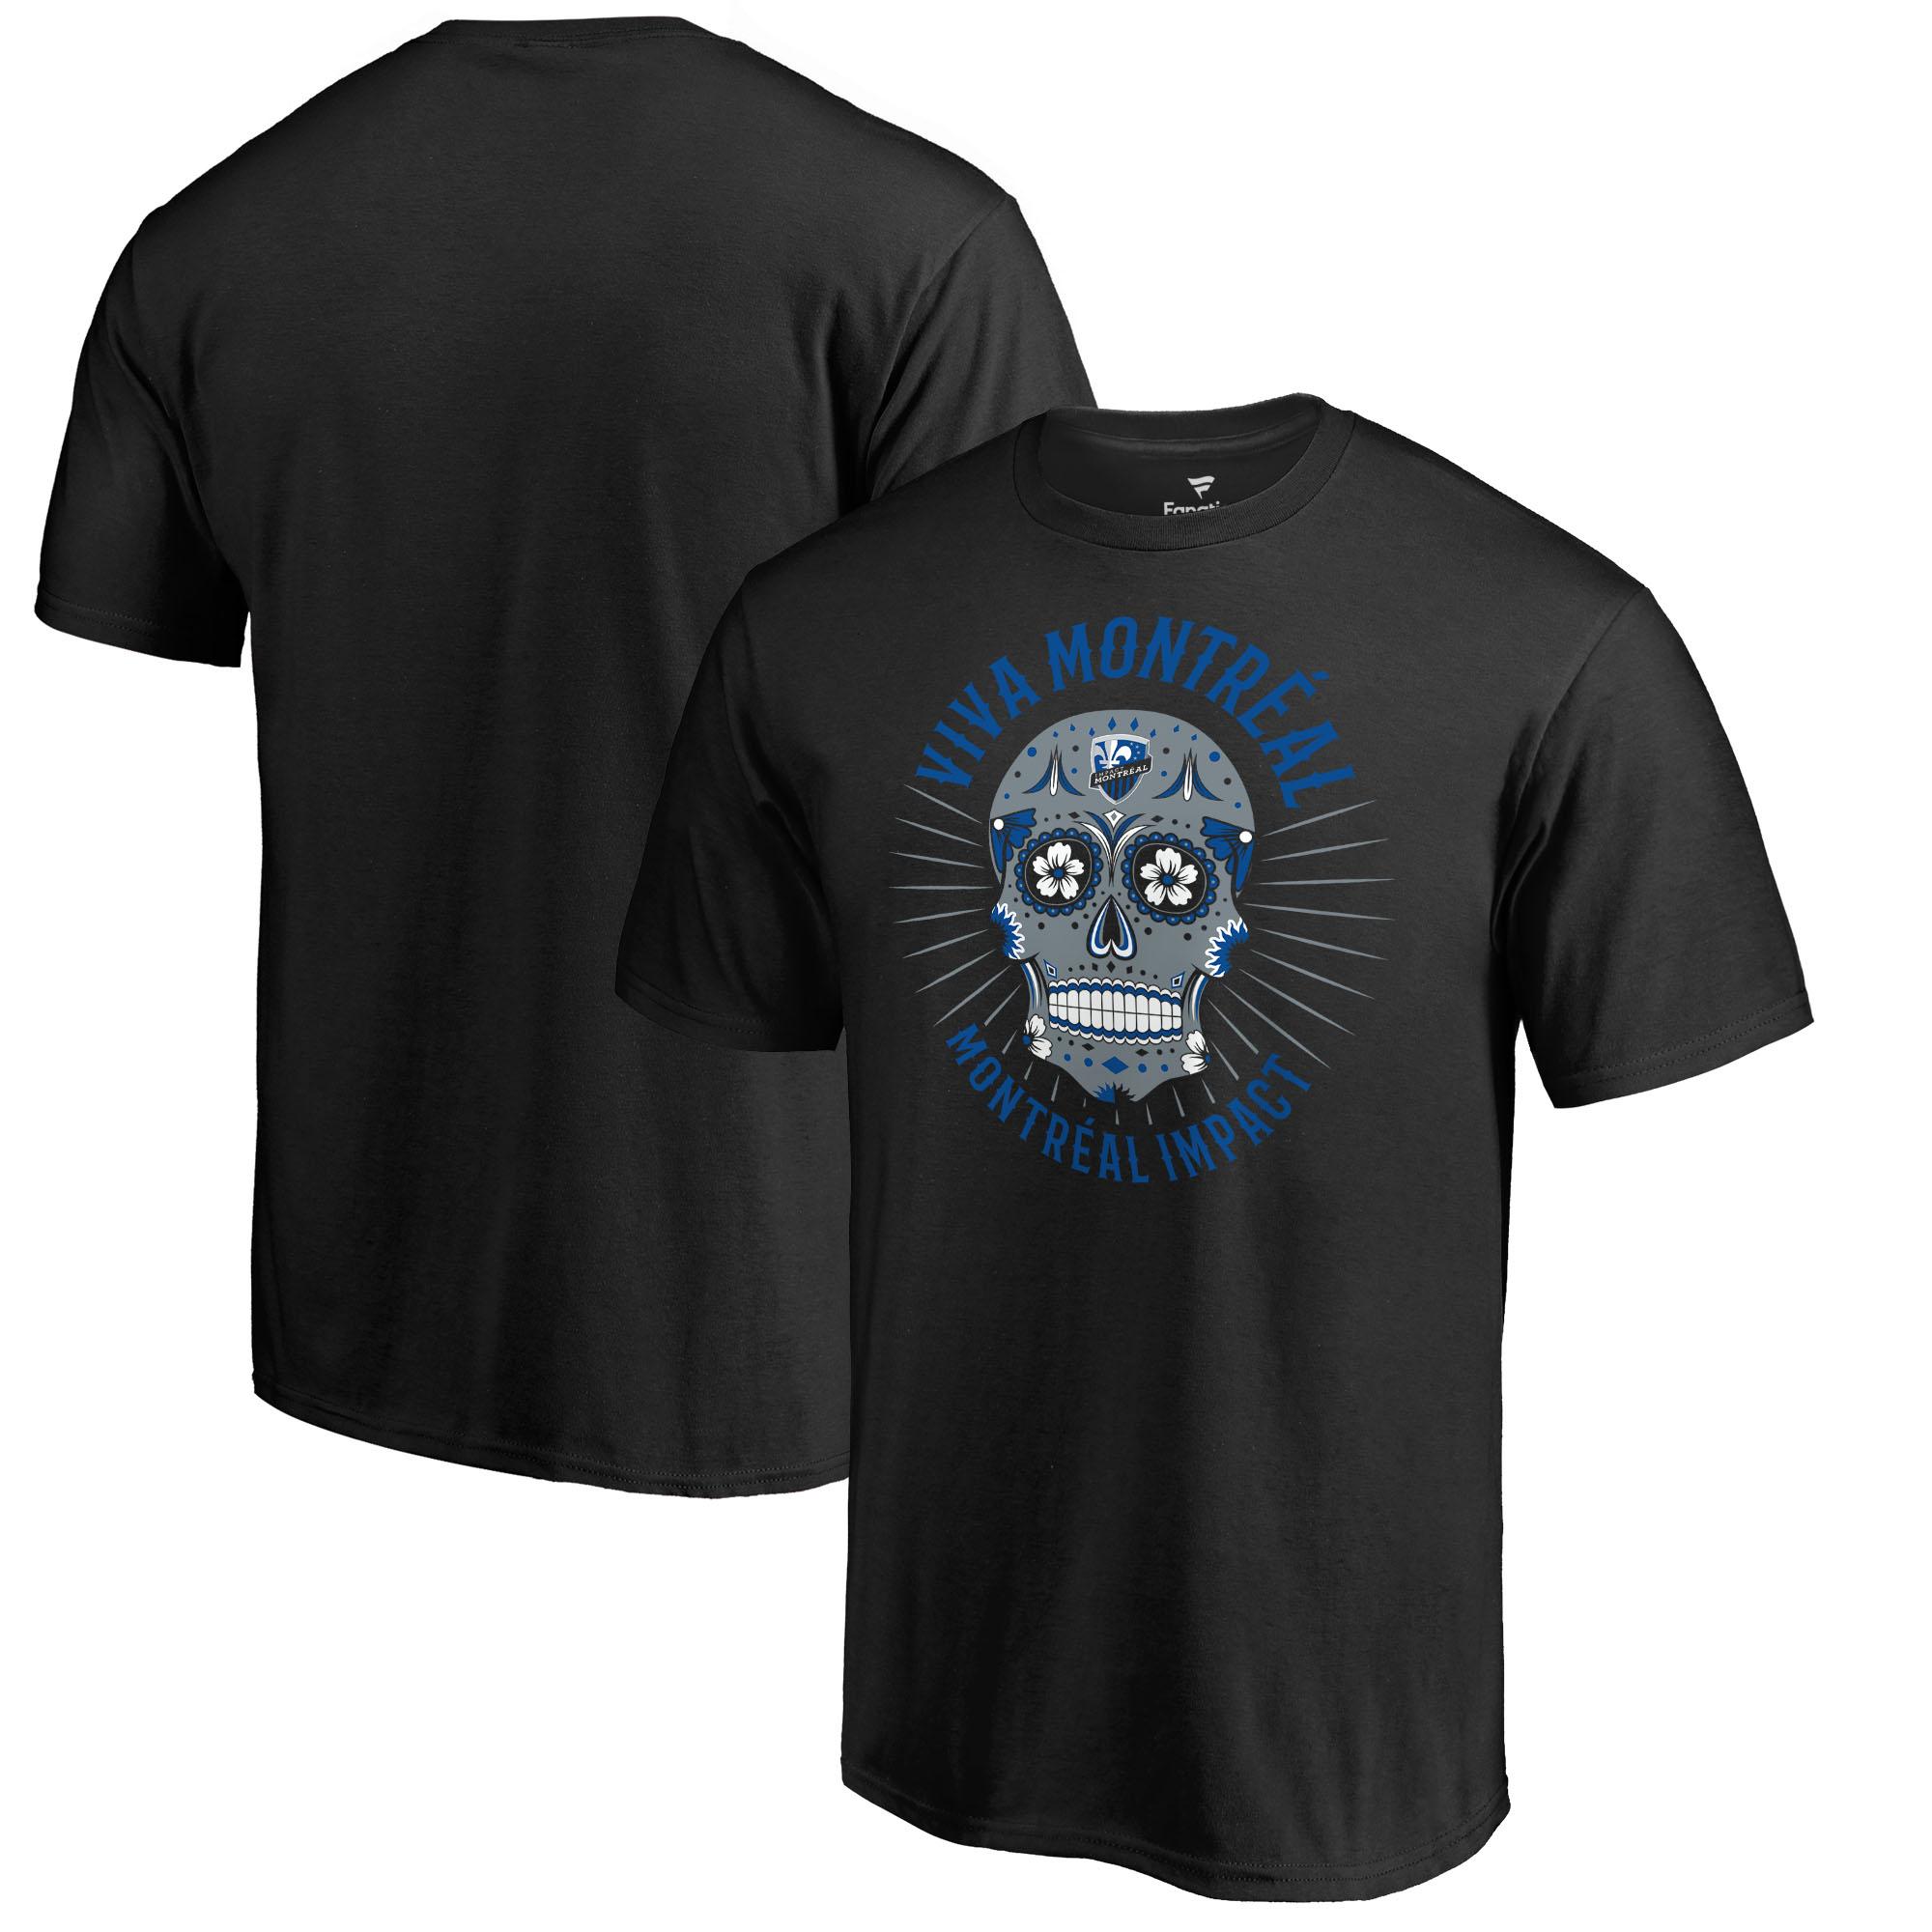 Montreal Impact Fanatics Branded Hispanic Heritage Viva T-Shirt T-Shirt - Black